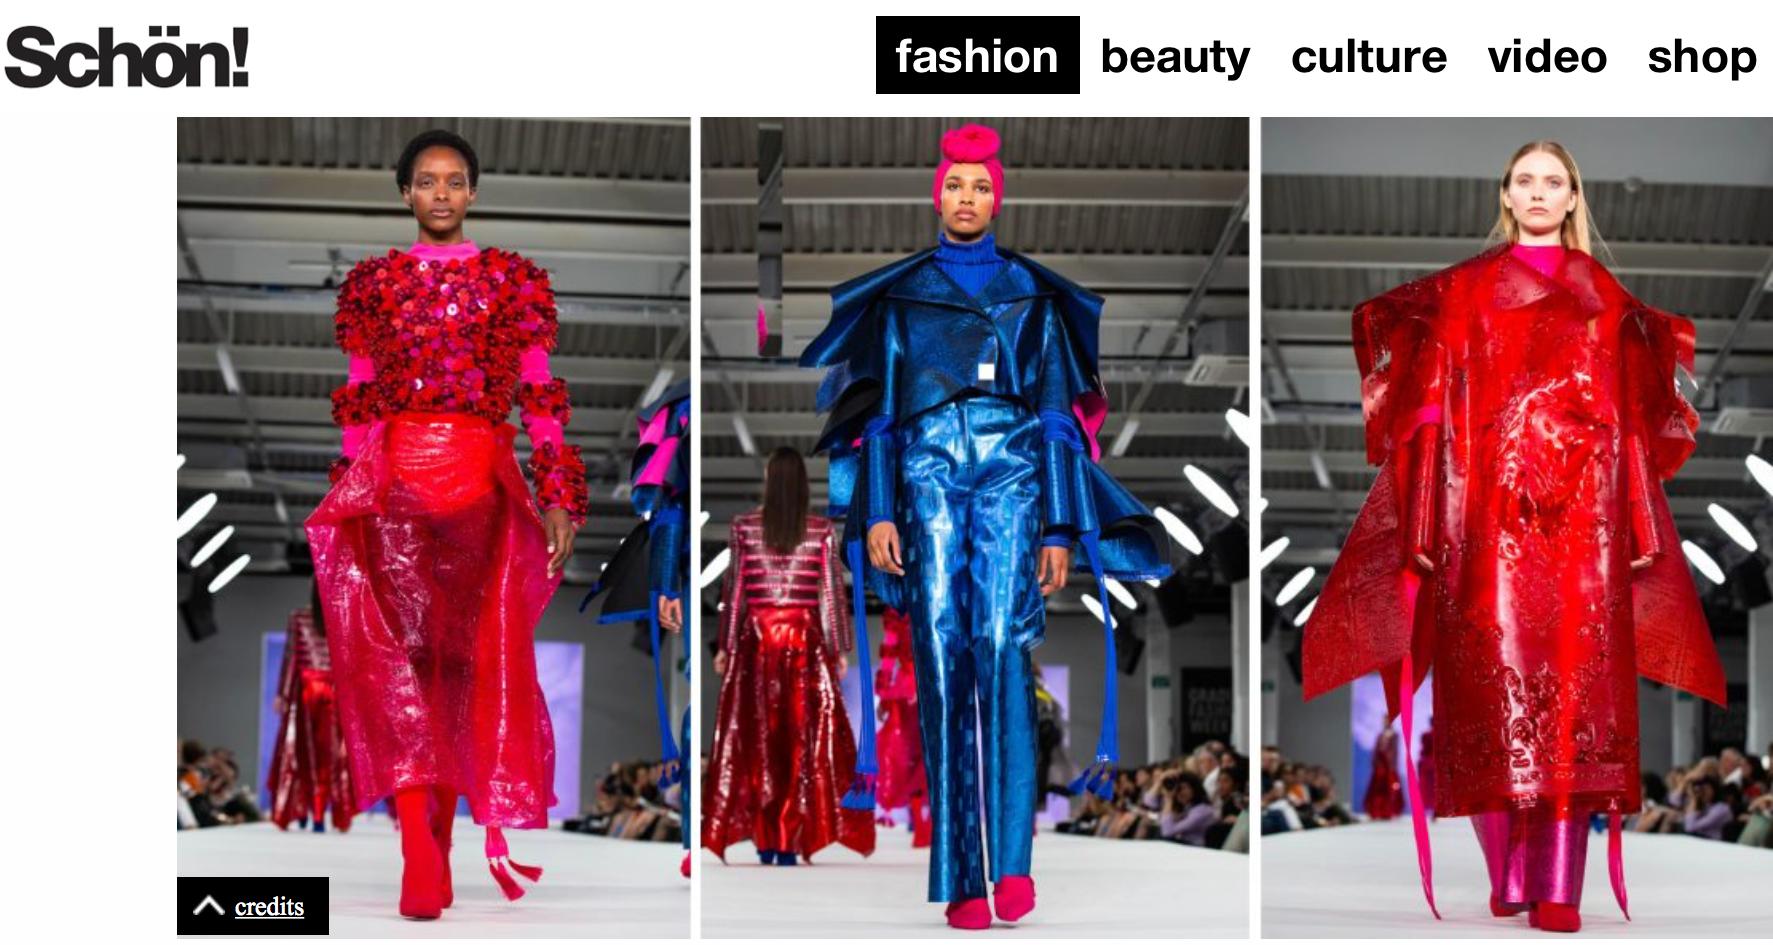 Schön! - Flourishing-Graduate Fashion Week11/06/2018